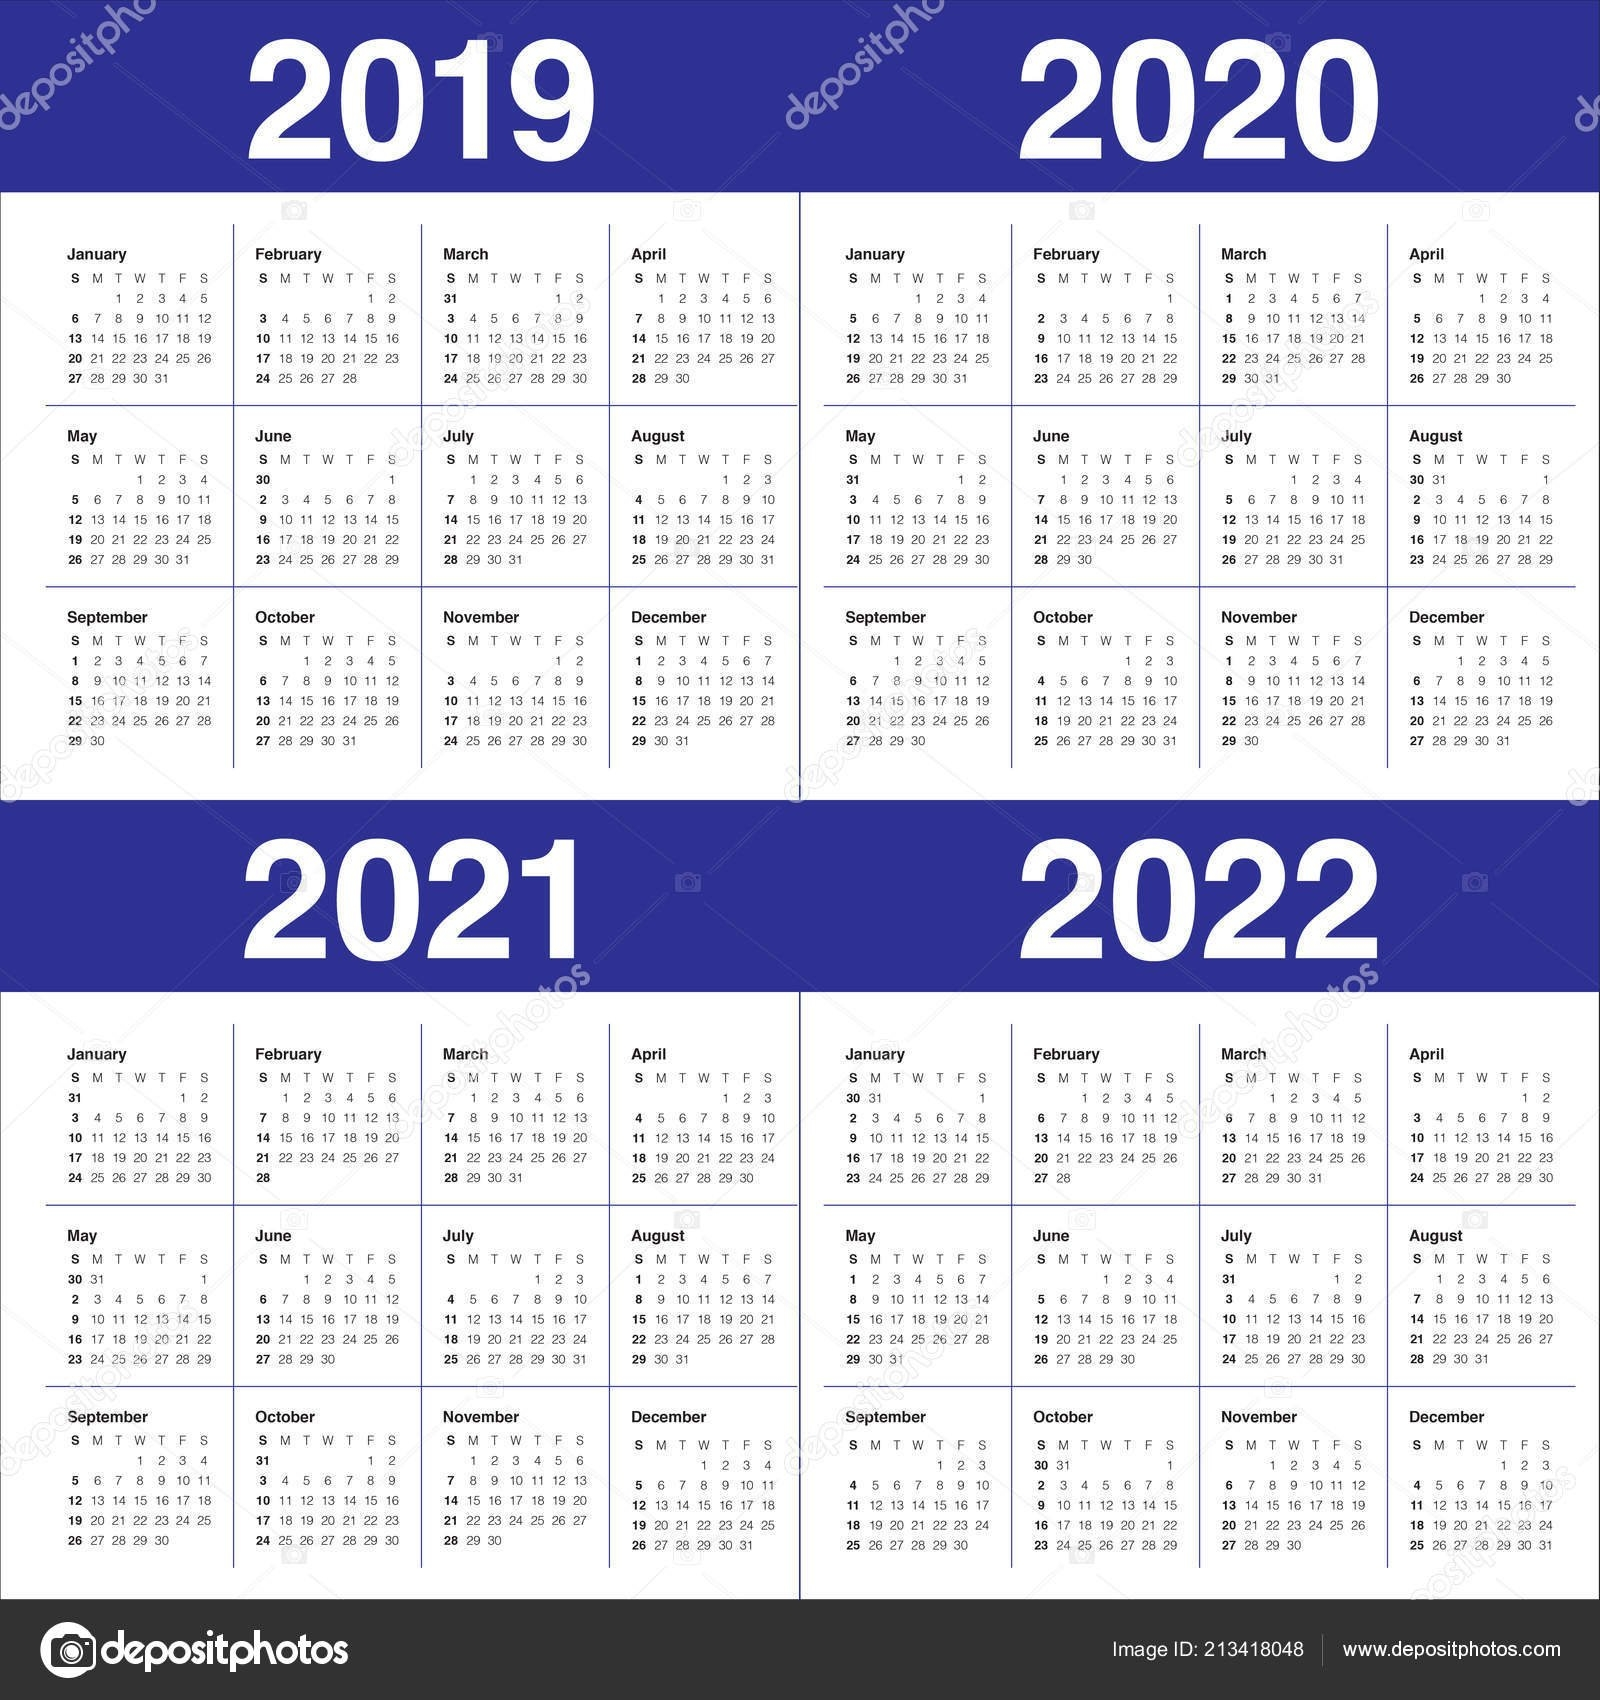 Pick 2 Year Calendar 2020 2021 | Calendar Printables Free Blank intended for Yrdsb Calendar 2019 2021